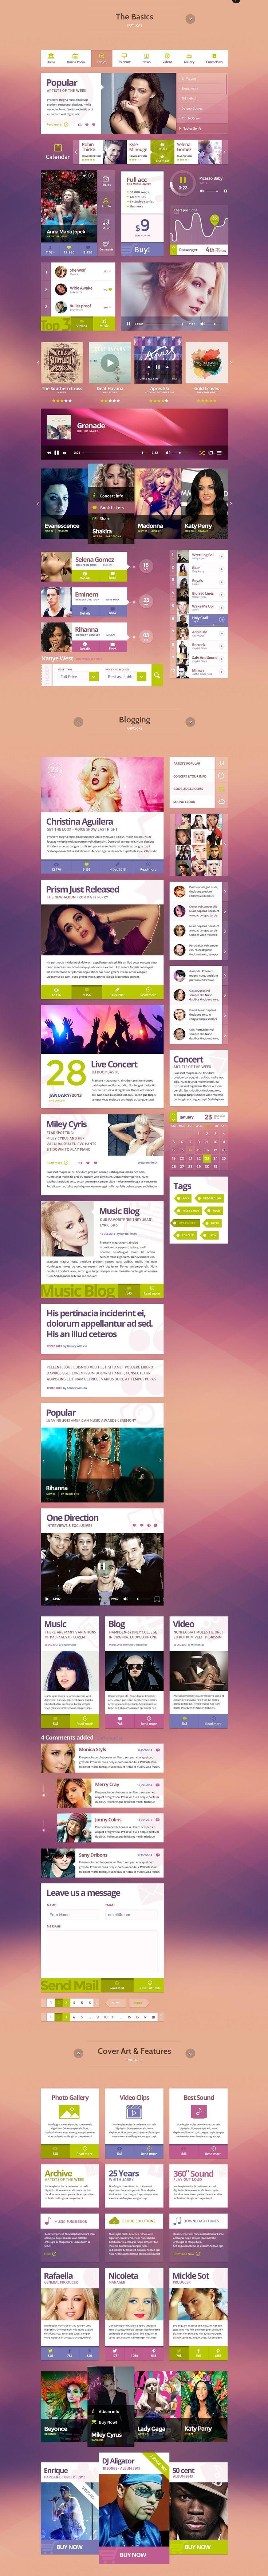 Funky Tunes UI Kit #graphics #web #design